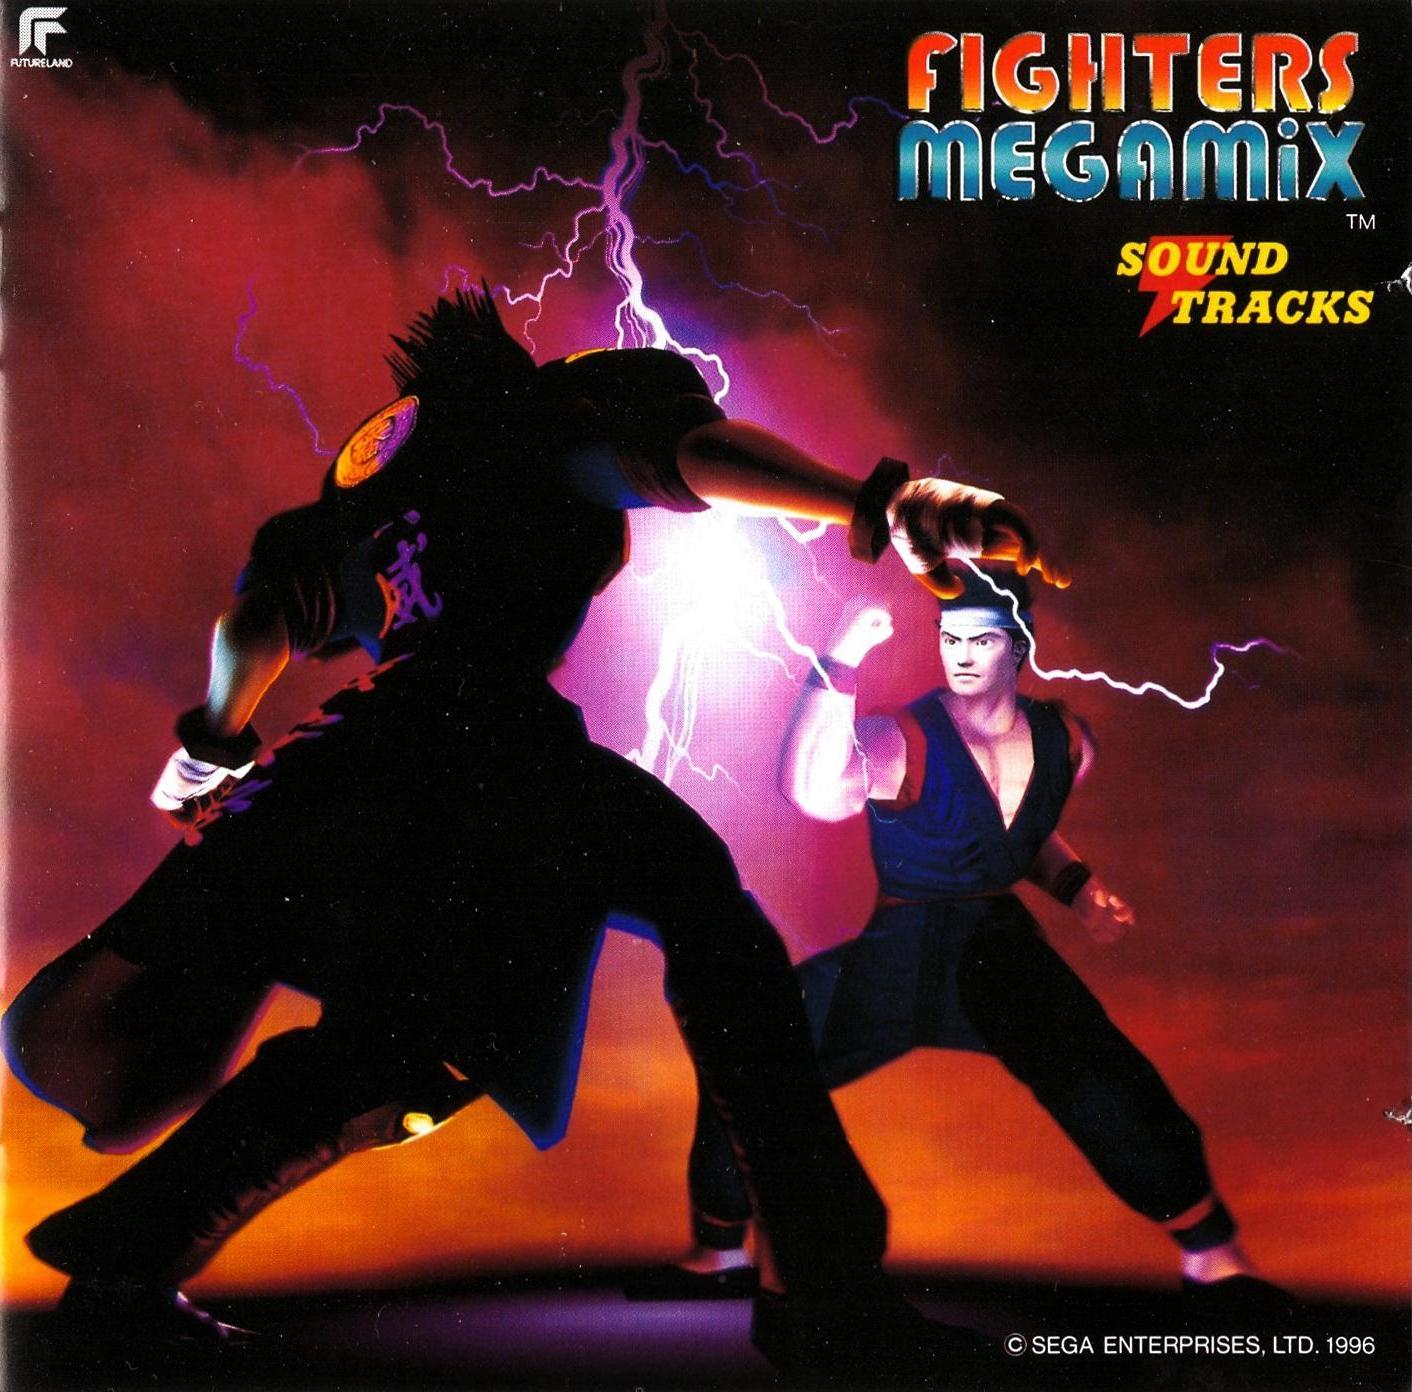 Fighters Megamix Sound Tracks